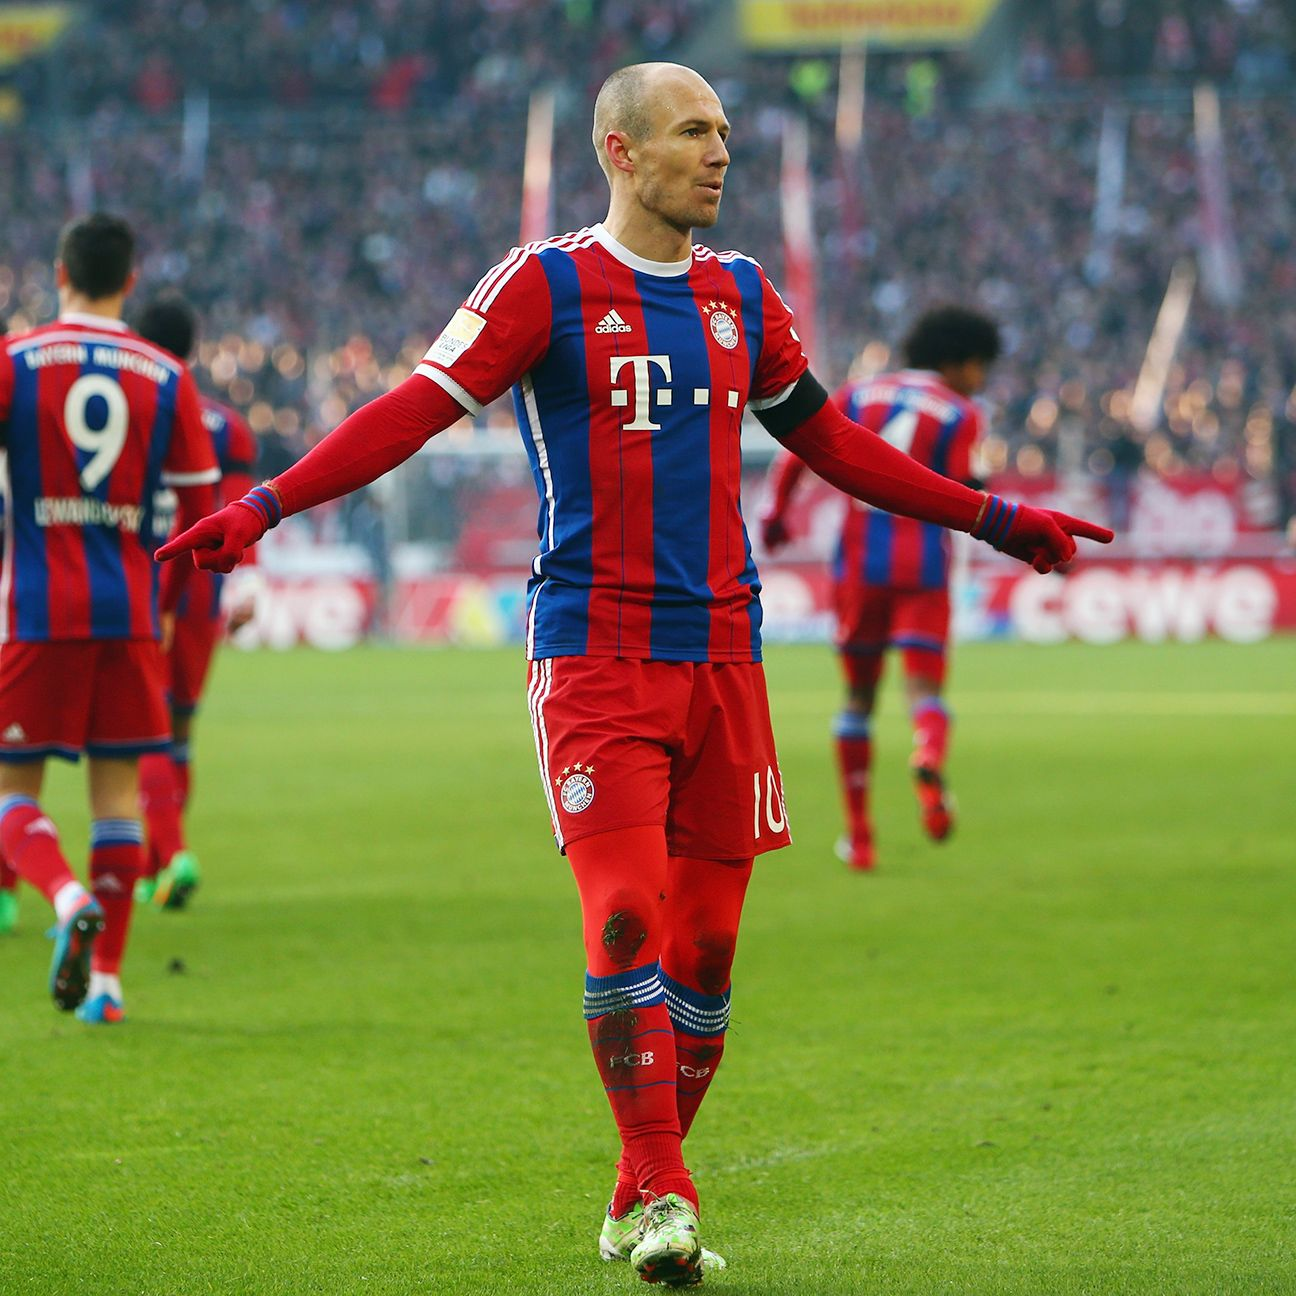 Bayern's mini-crisis came to an abrupt halt thanks to Arjen Robben's first-half wonder strike at Stuttgart.